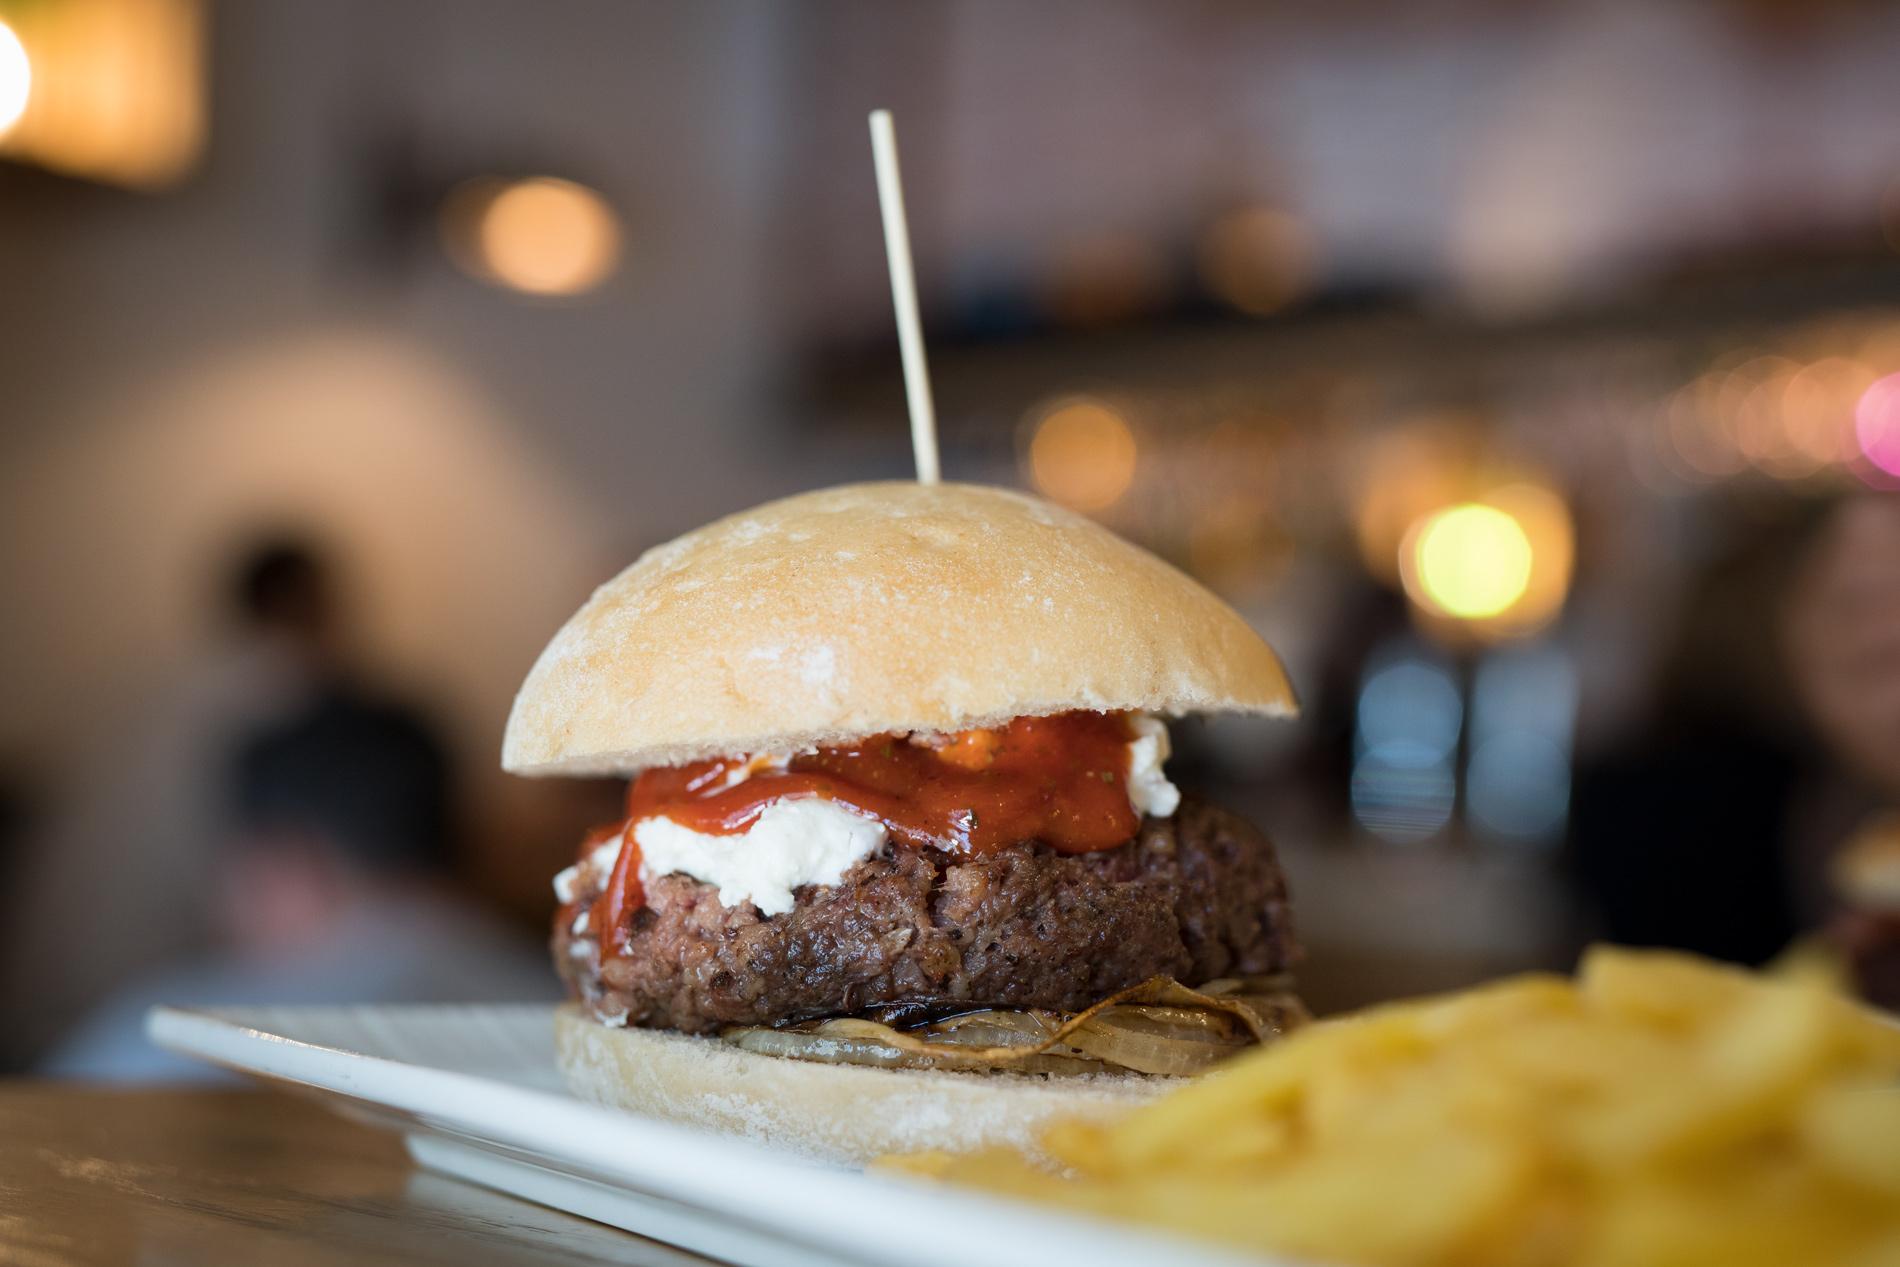 Gobu Burger, espectaculares hamburguesas al carbón